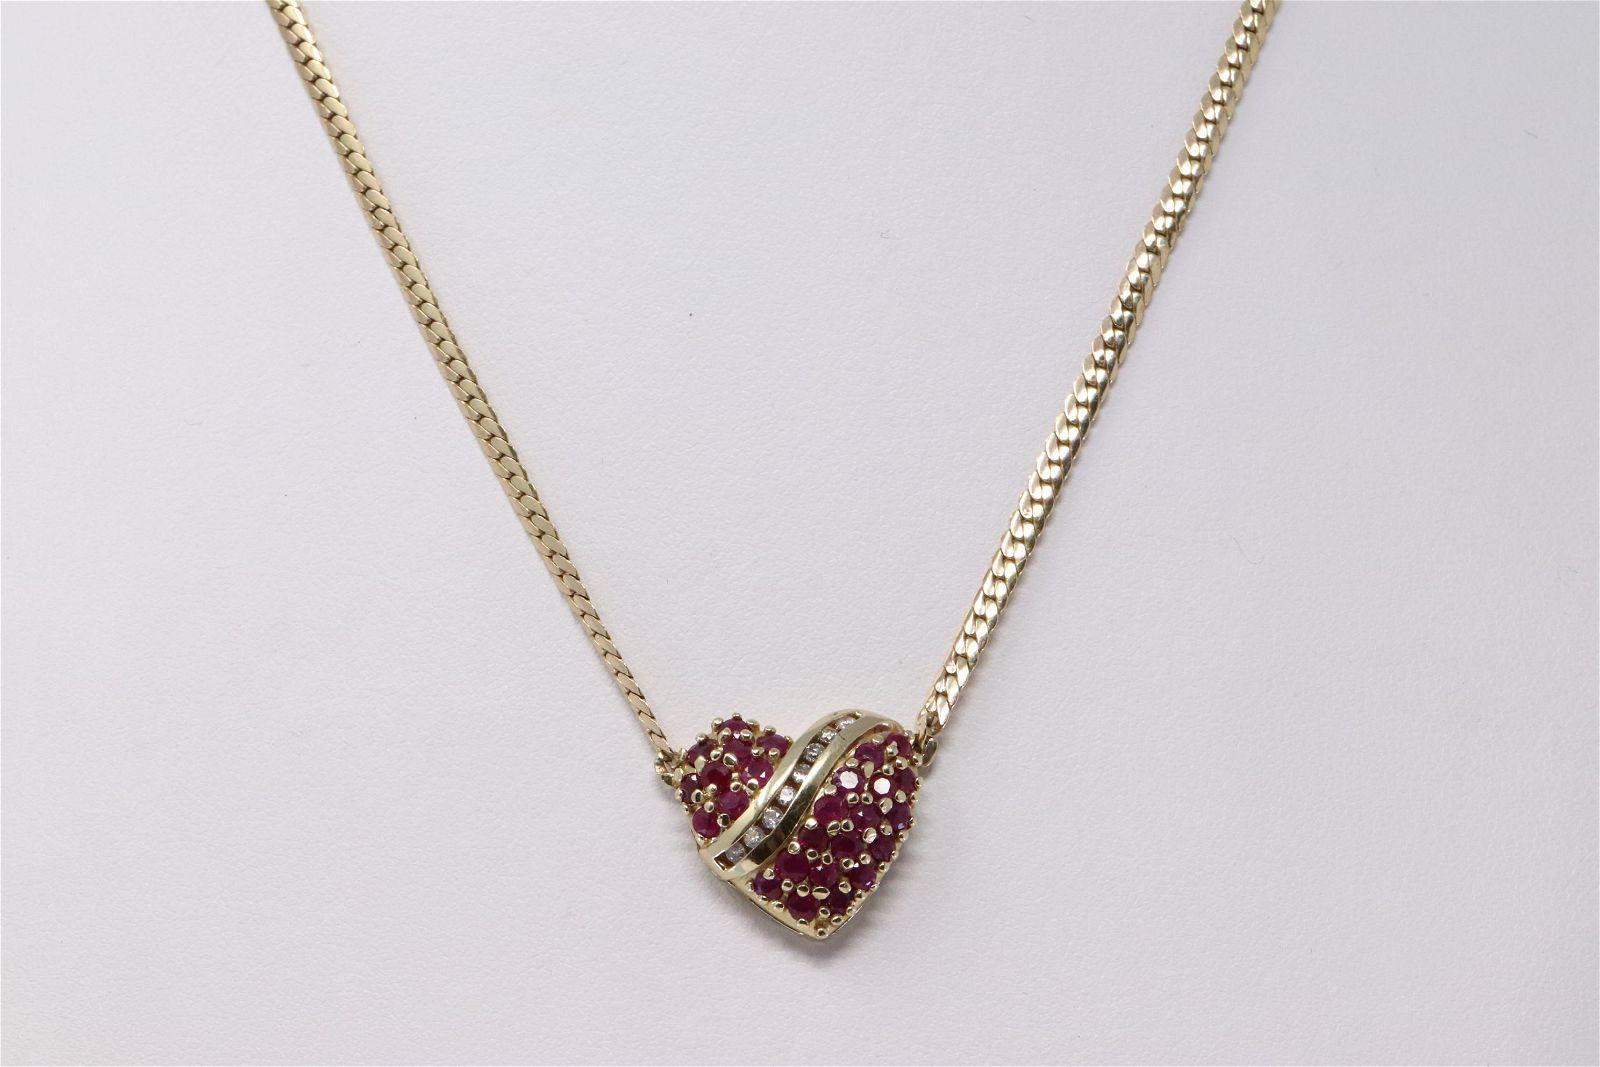 14Kt Yellow Gold Diamond Heart Necklace.